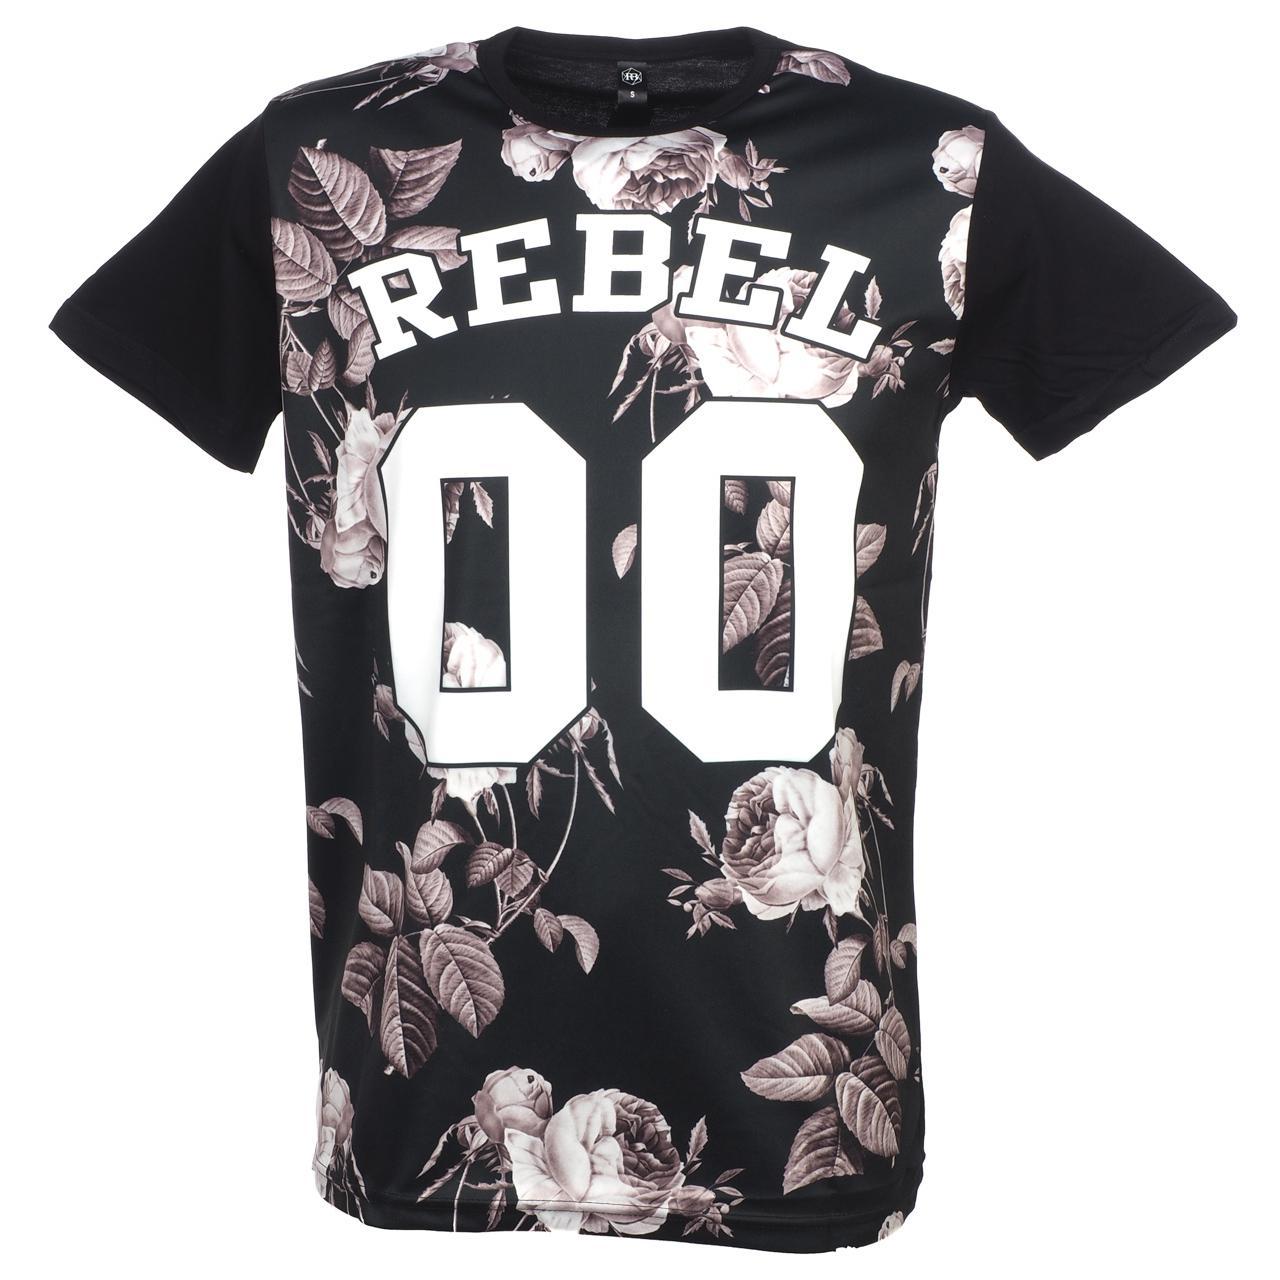 Tee-shirt-manches-courtes-Rivaldi-black-Merleana-black-mc-tee-Noir-58563-Neuf